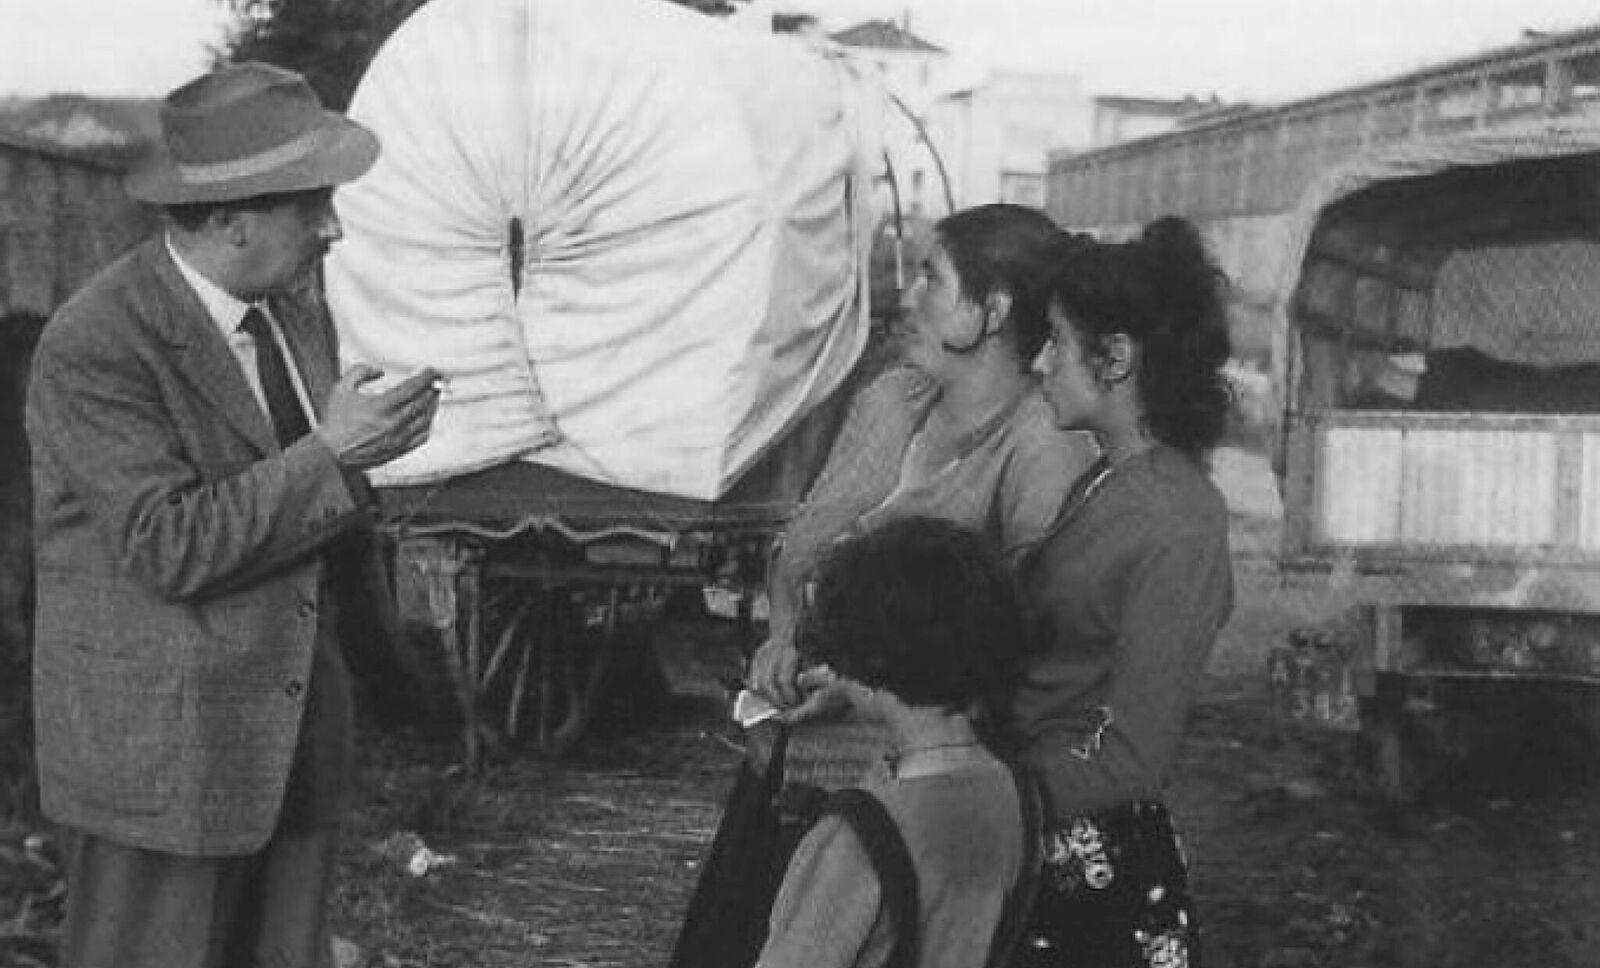 Pinot Gallizio en Alba. Cortesía: Archivo Gallizio, Turín.